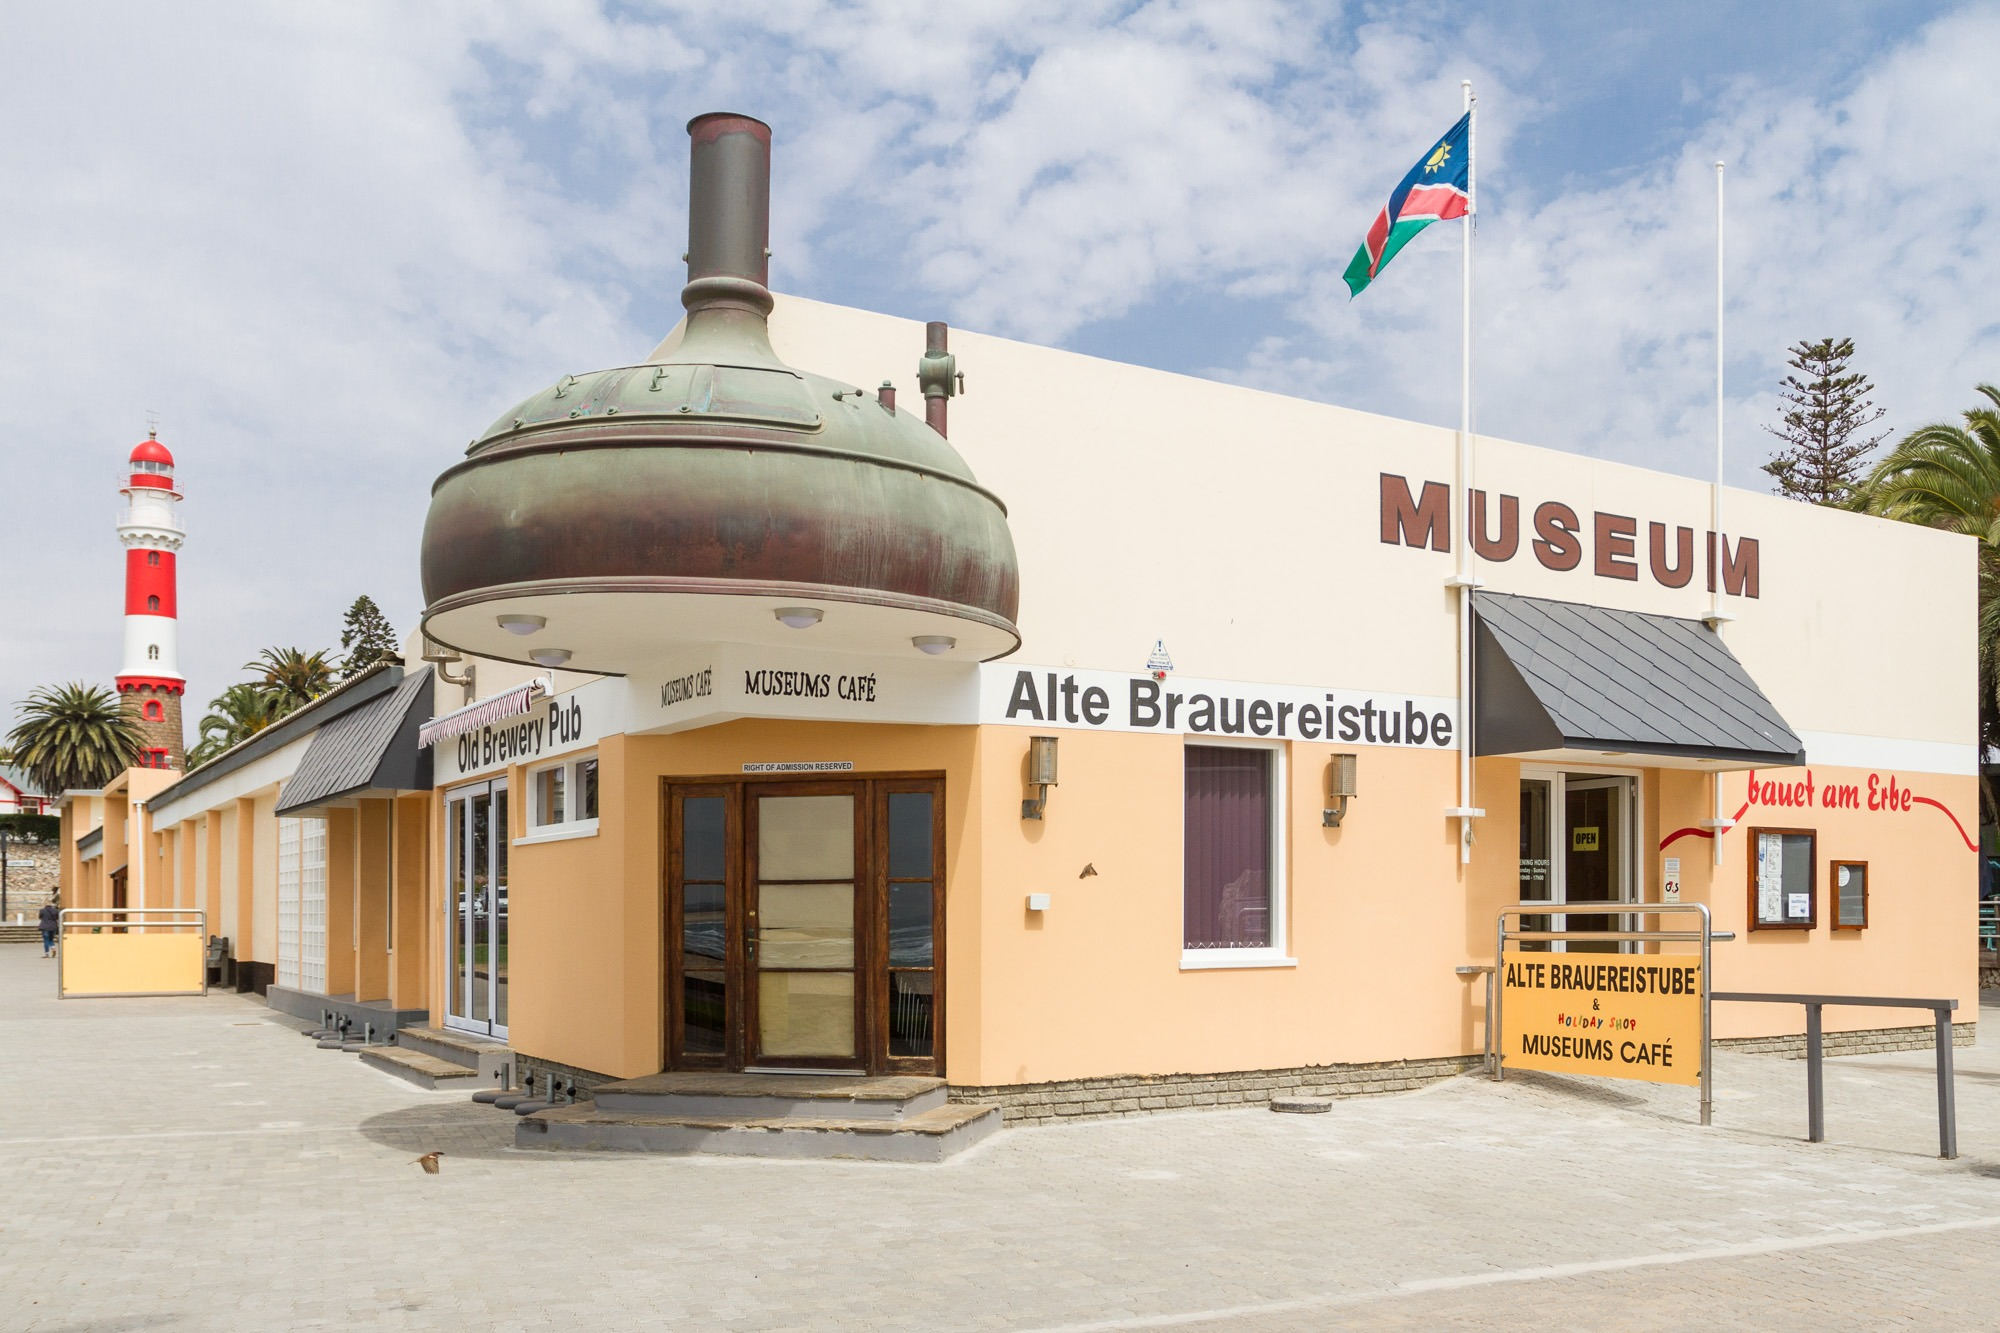 Alte Brauereistube Swakopmund Namibia